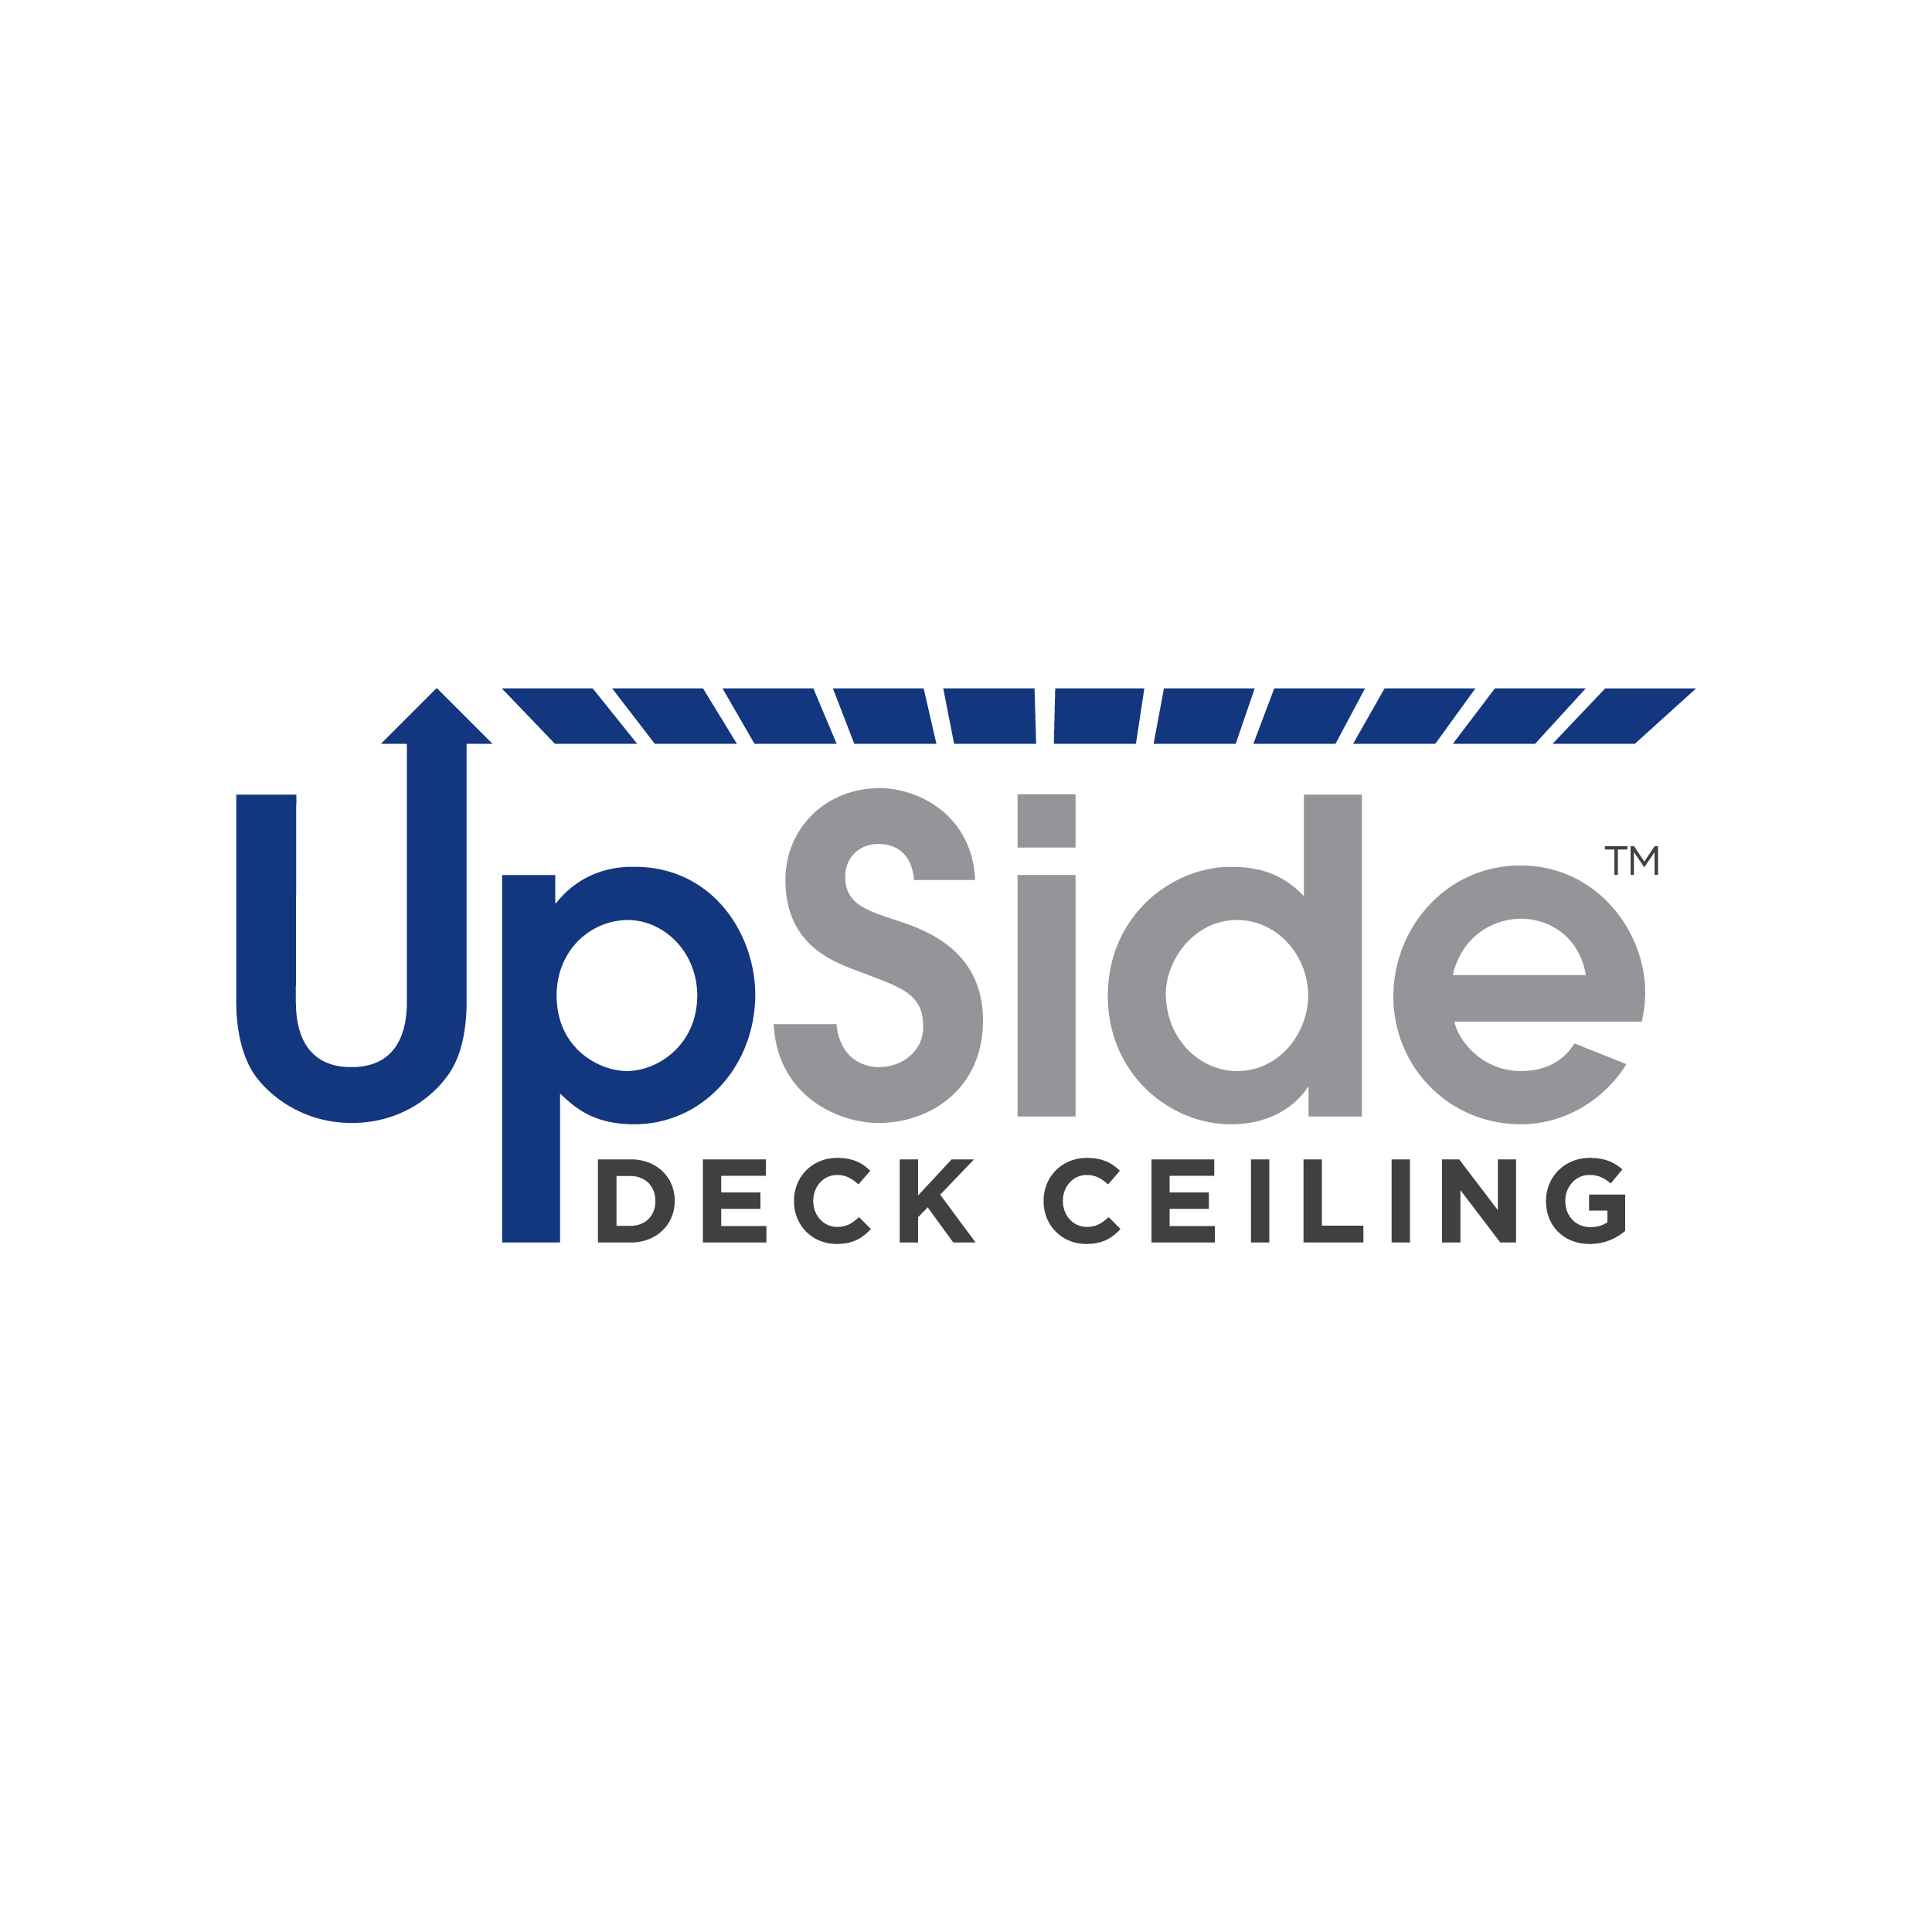 UpSide Deck Ceiling